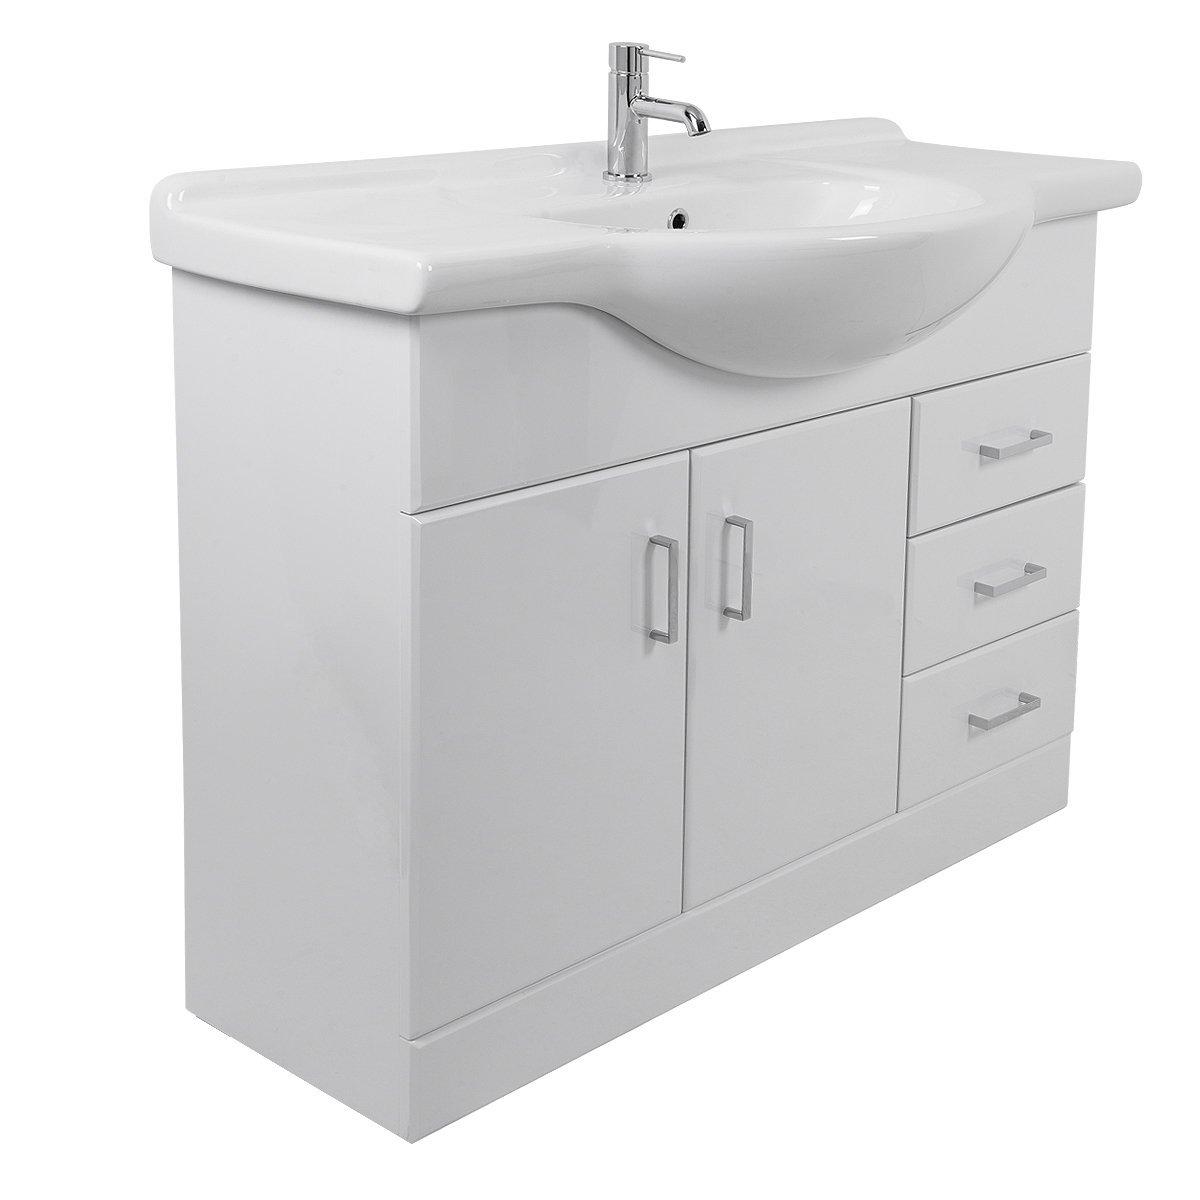 Aquariss Absolute White Vanity Unit Basin - 1200mm